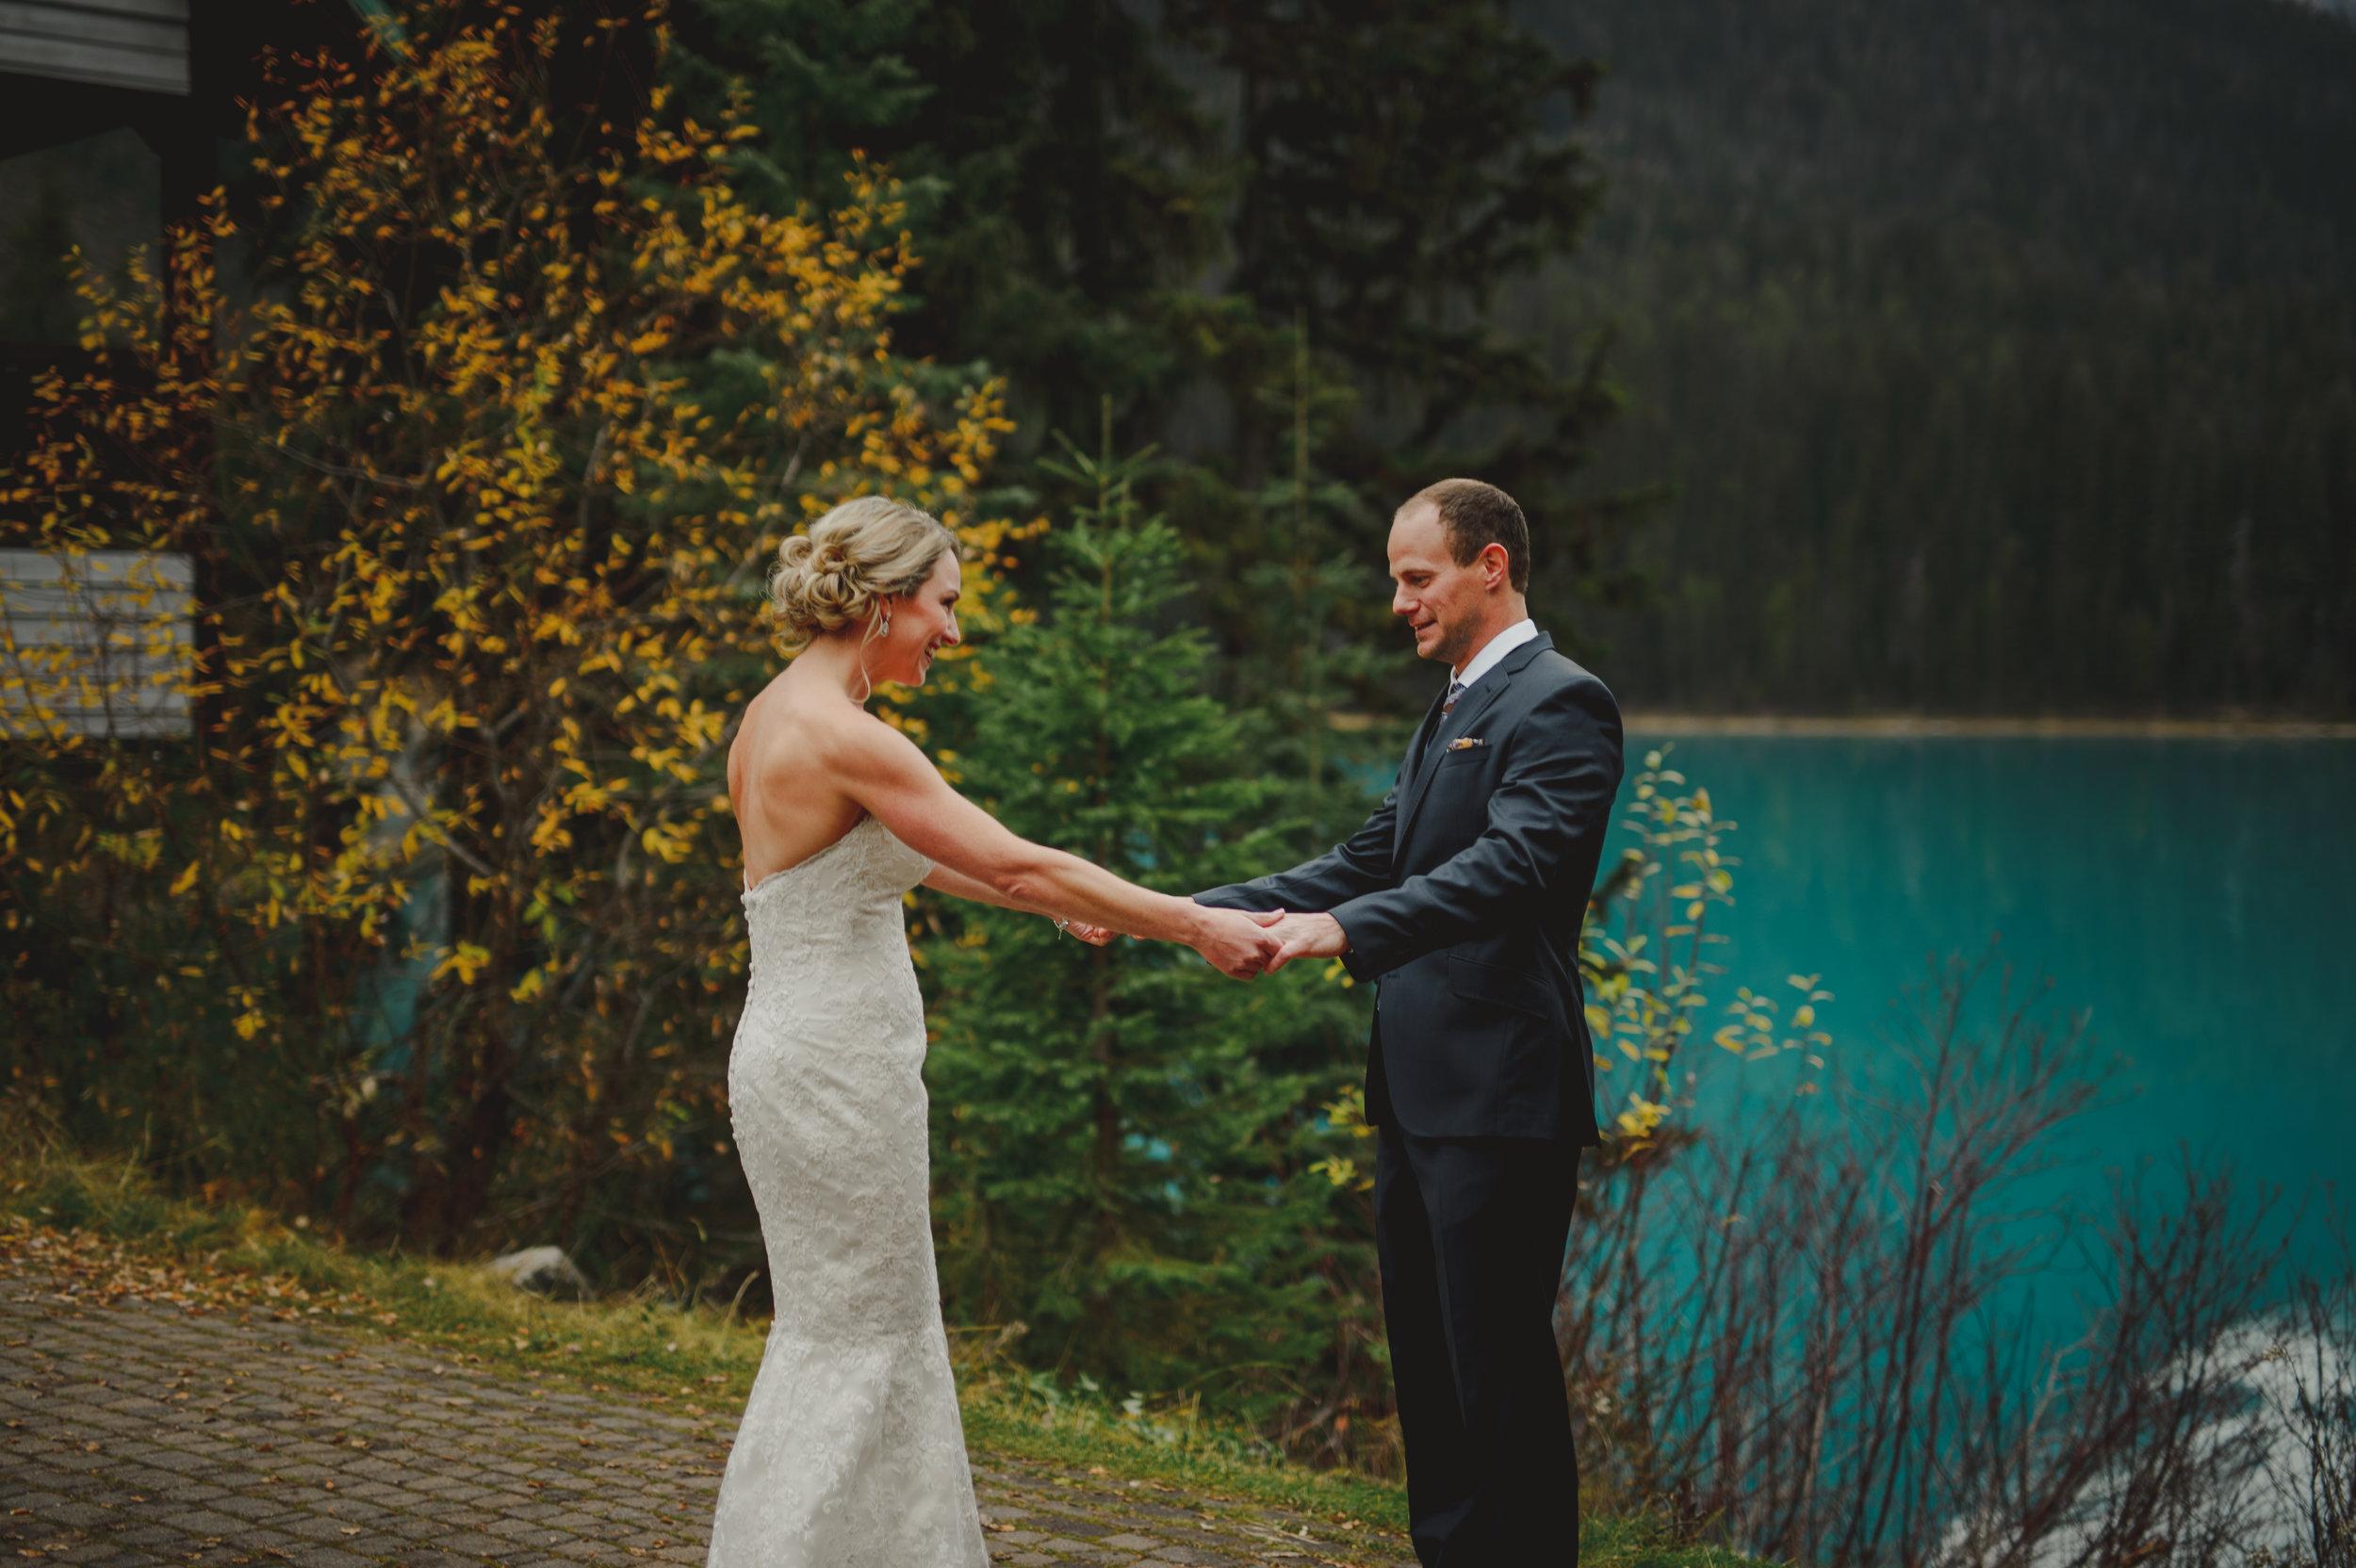 Banff-Wedding-Photographer-10.jpg